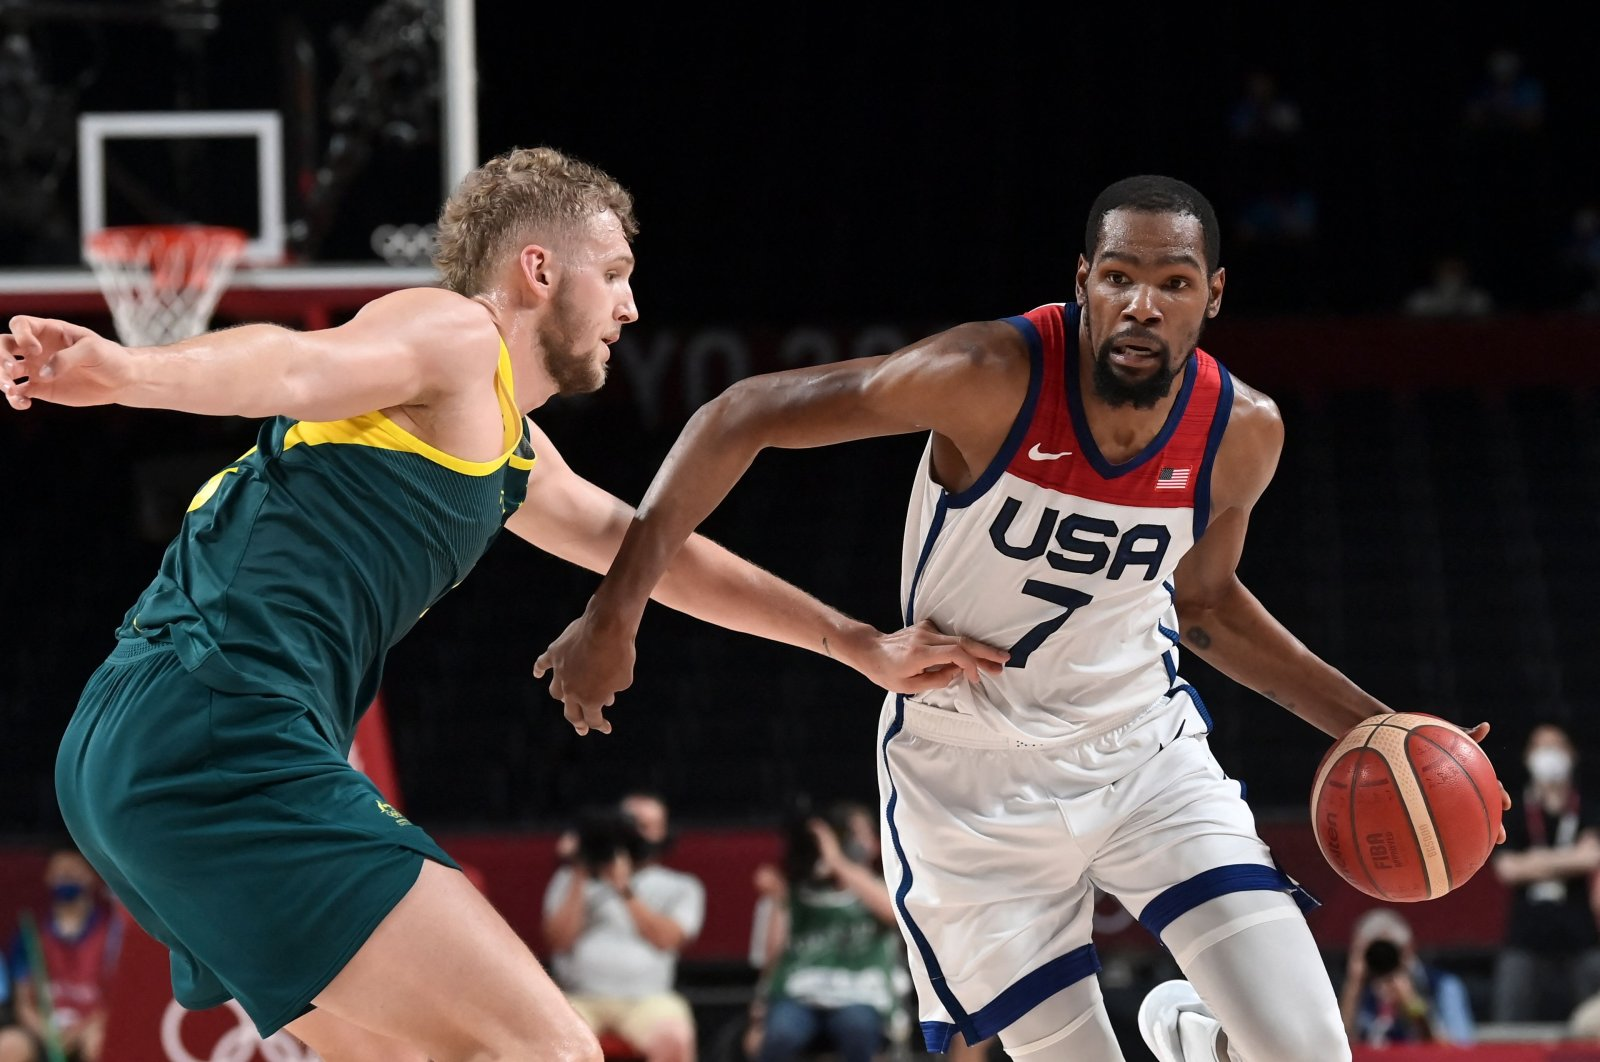 USA's Kevin Durant dribbles past Australia's Jock Landale (L) in the Tokyo 2020 Olympic Games men's semifinal at the Saitama Super Arena, Saitama, Japan, Aug. 5, 2021. (AFP Photo)